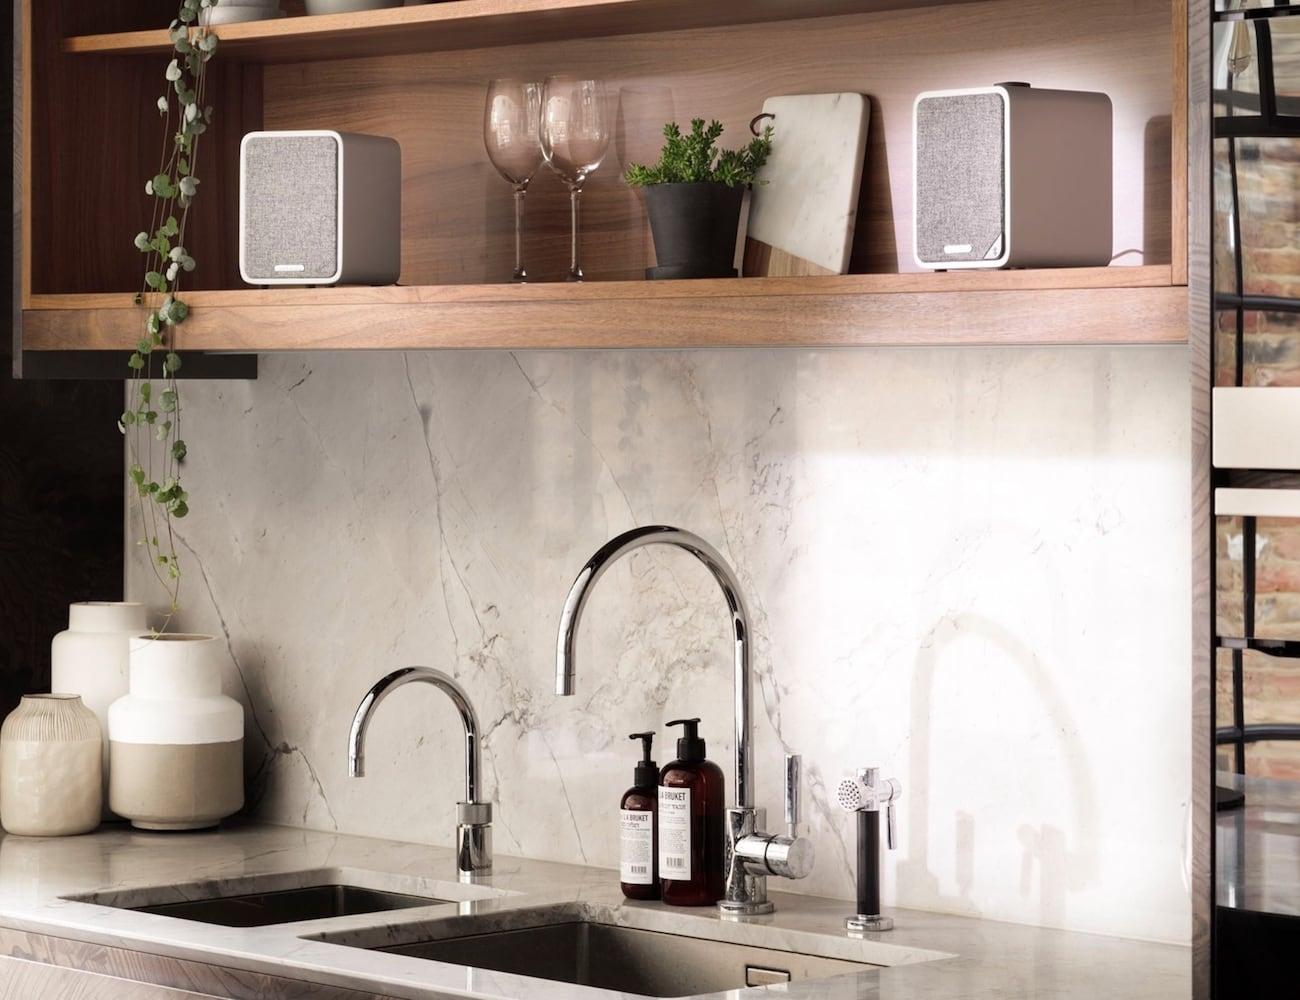 Ruark Audio MR1 Bluetooth Speaker System